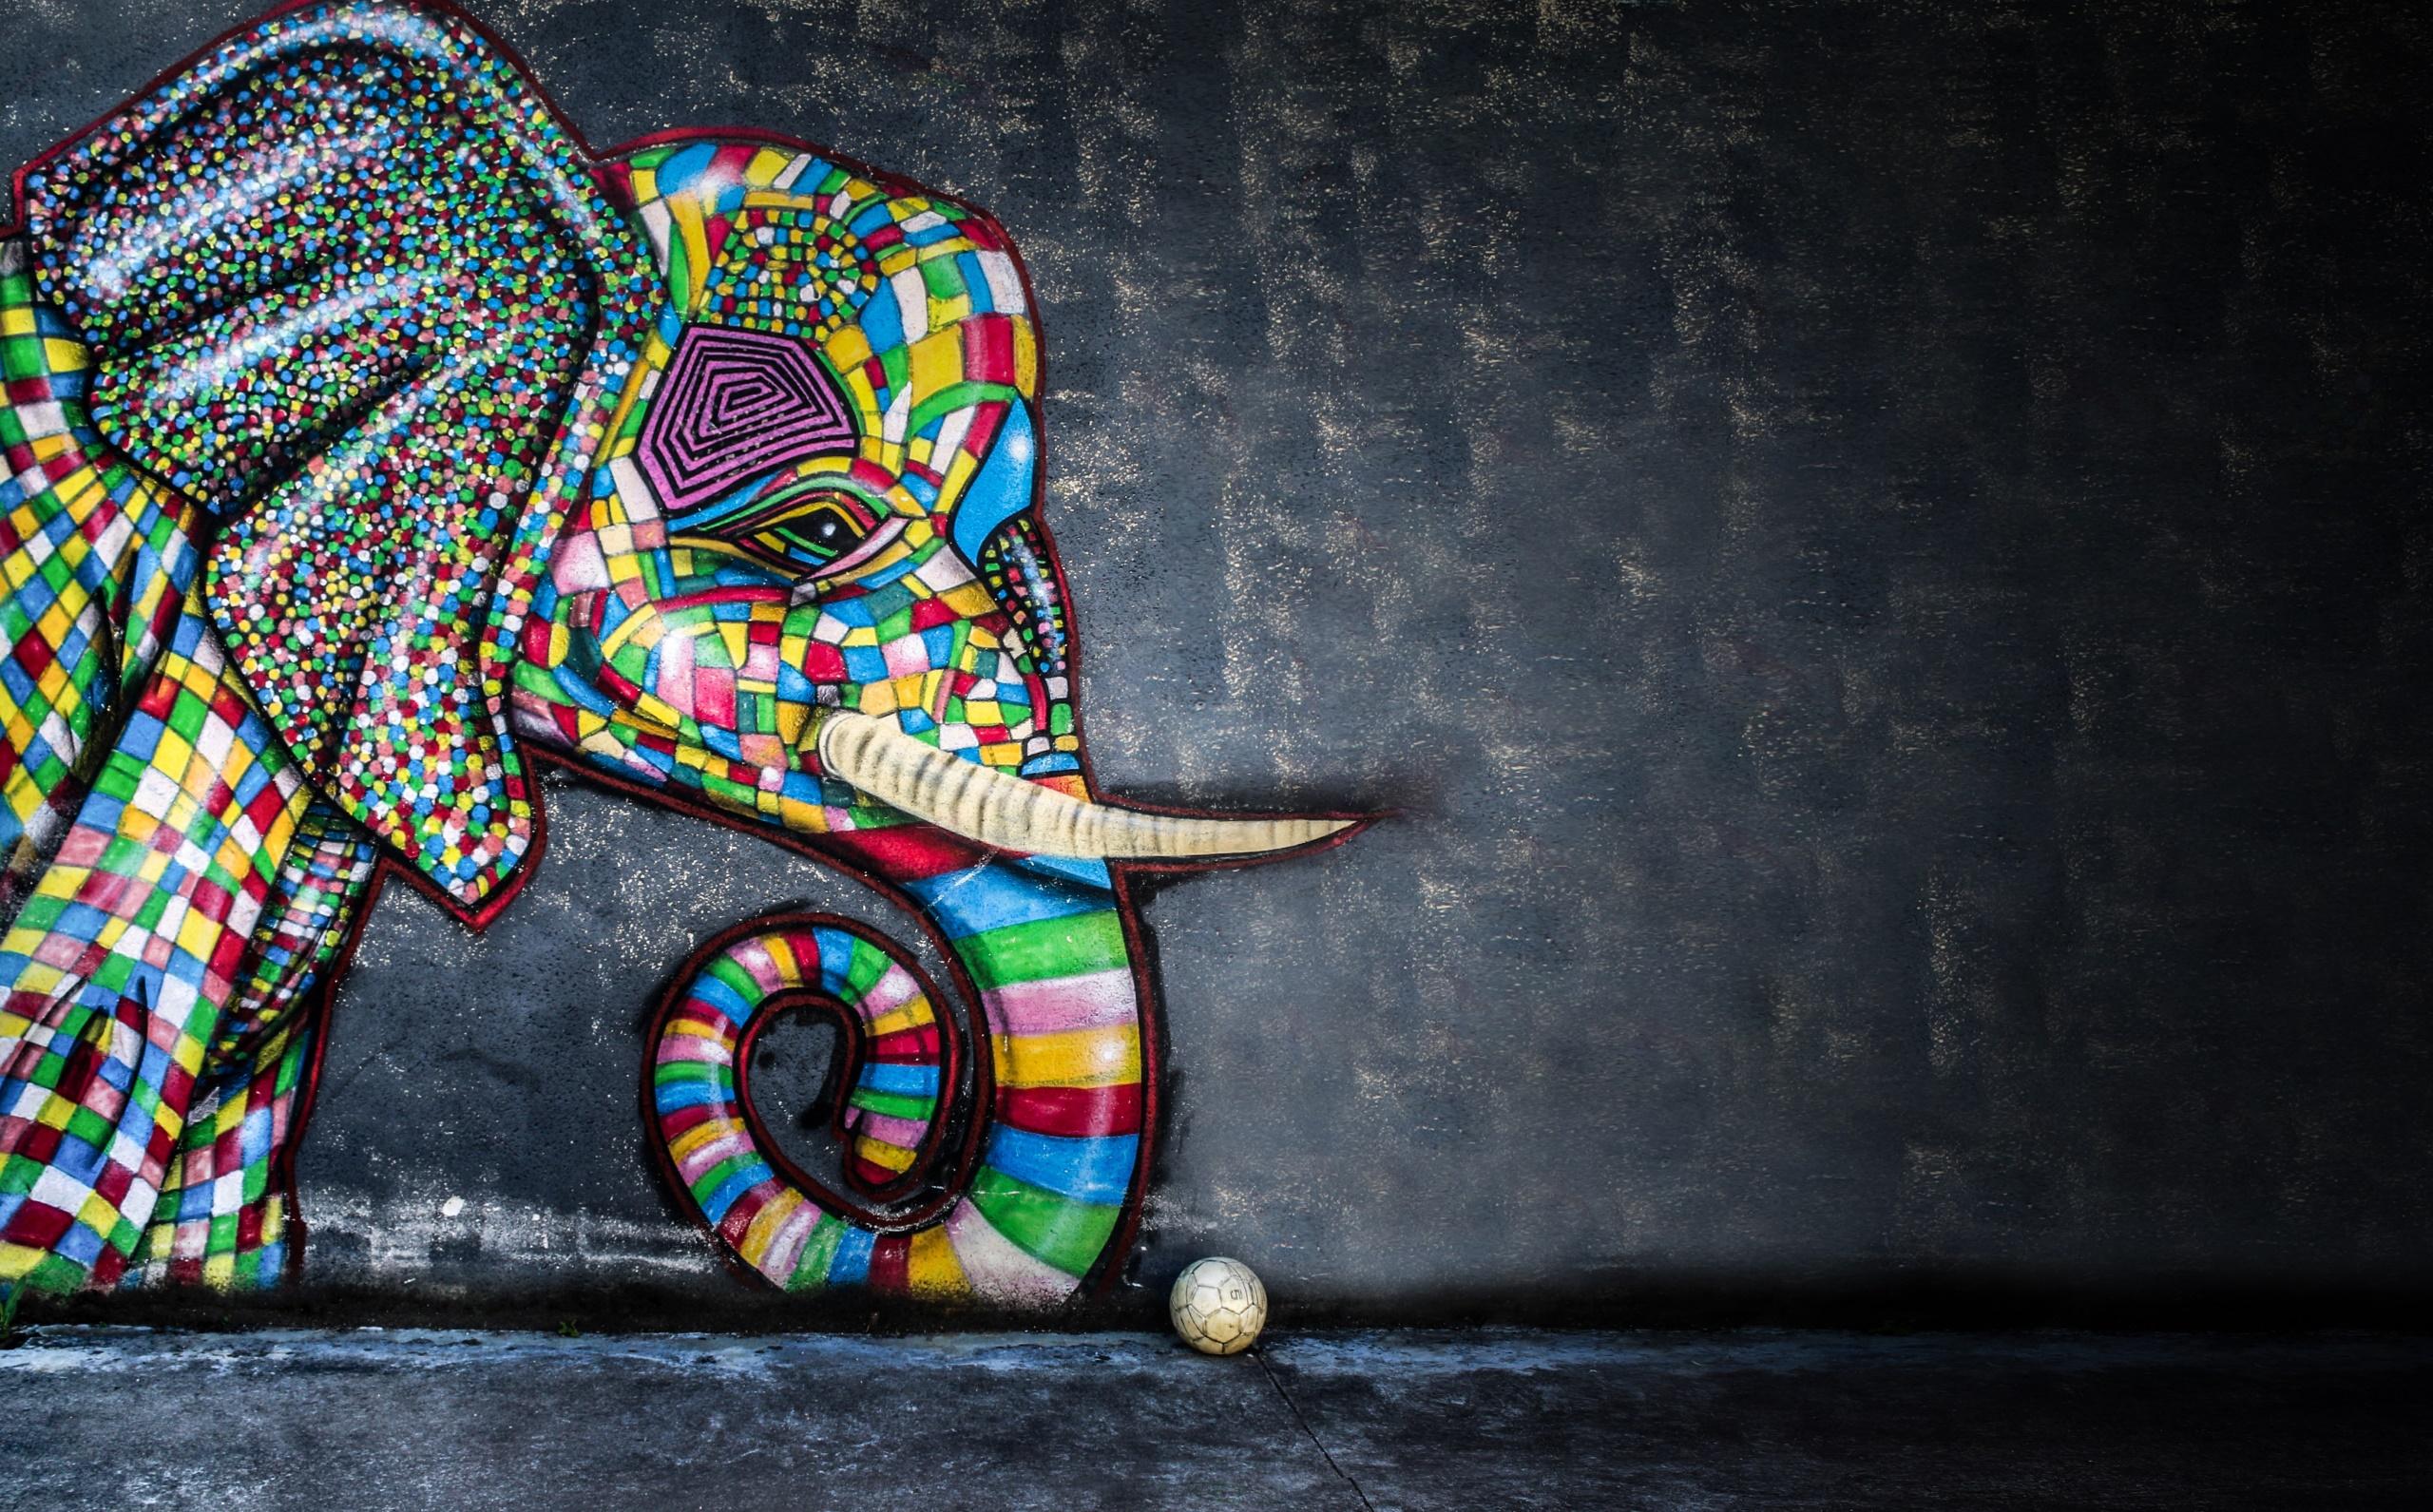 Balls Artwork Colorful Elephant